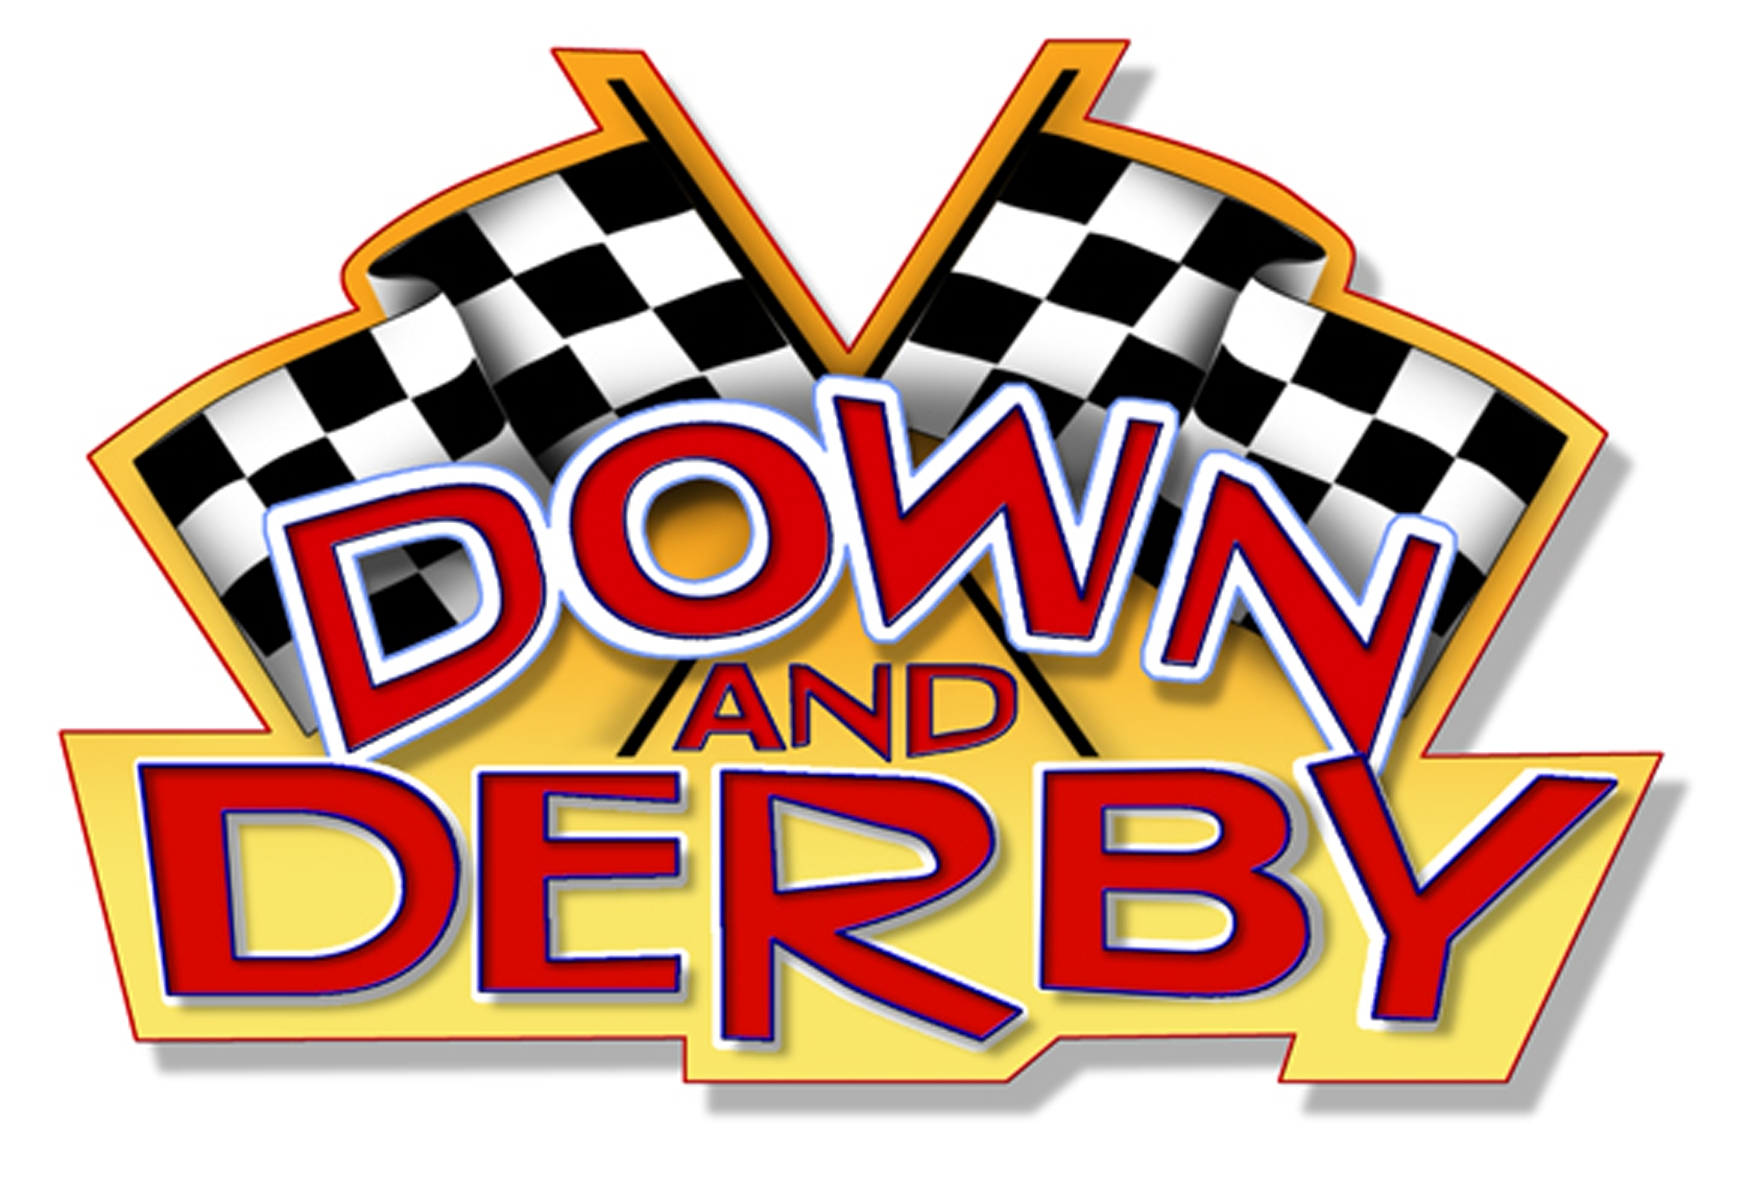 Pinewood derby clipart best